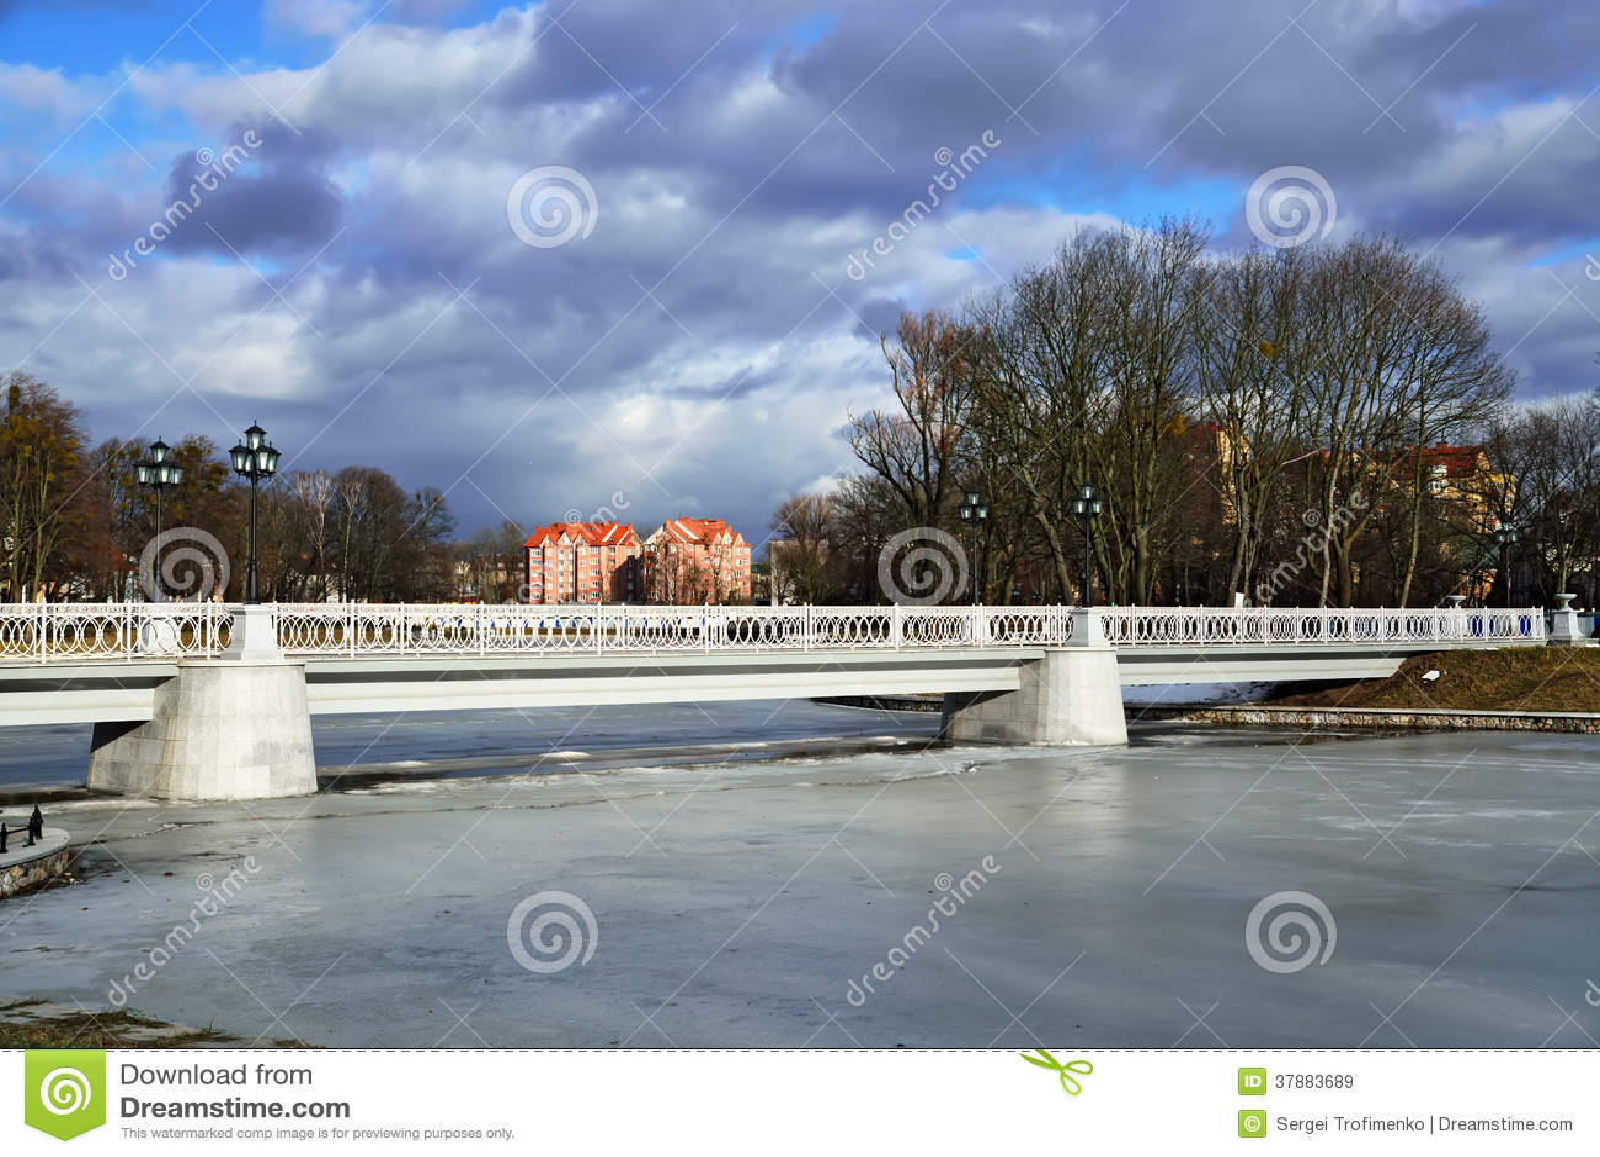 Witte brug op het Verhnee-meer (vroeger Oberteich). Kaliningrad, Rusland